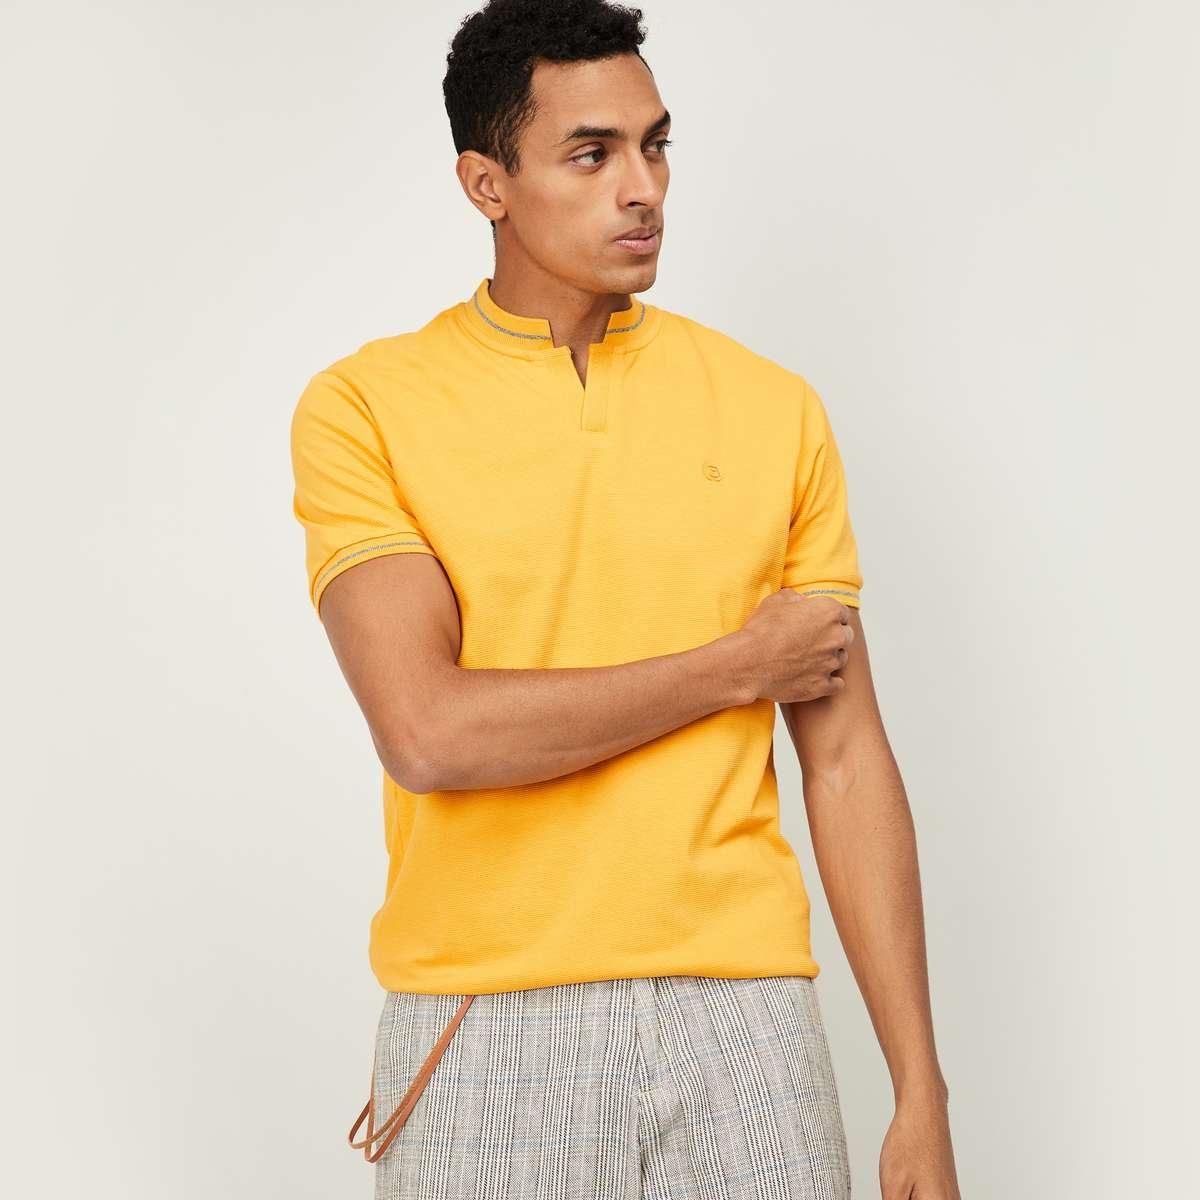 7.BOSSINI Men Solid Short Sleeves Polo Collar T-shirt